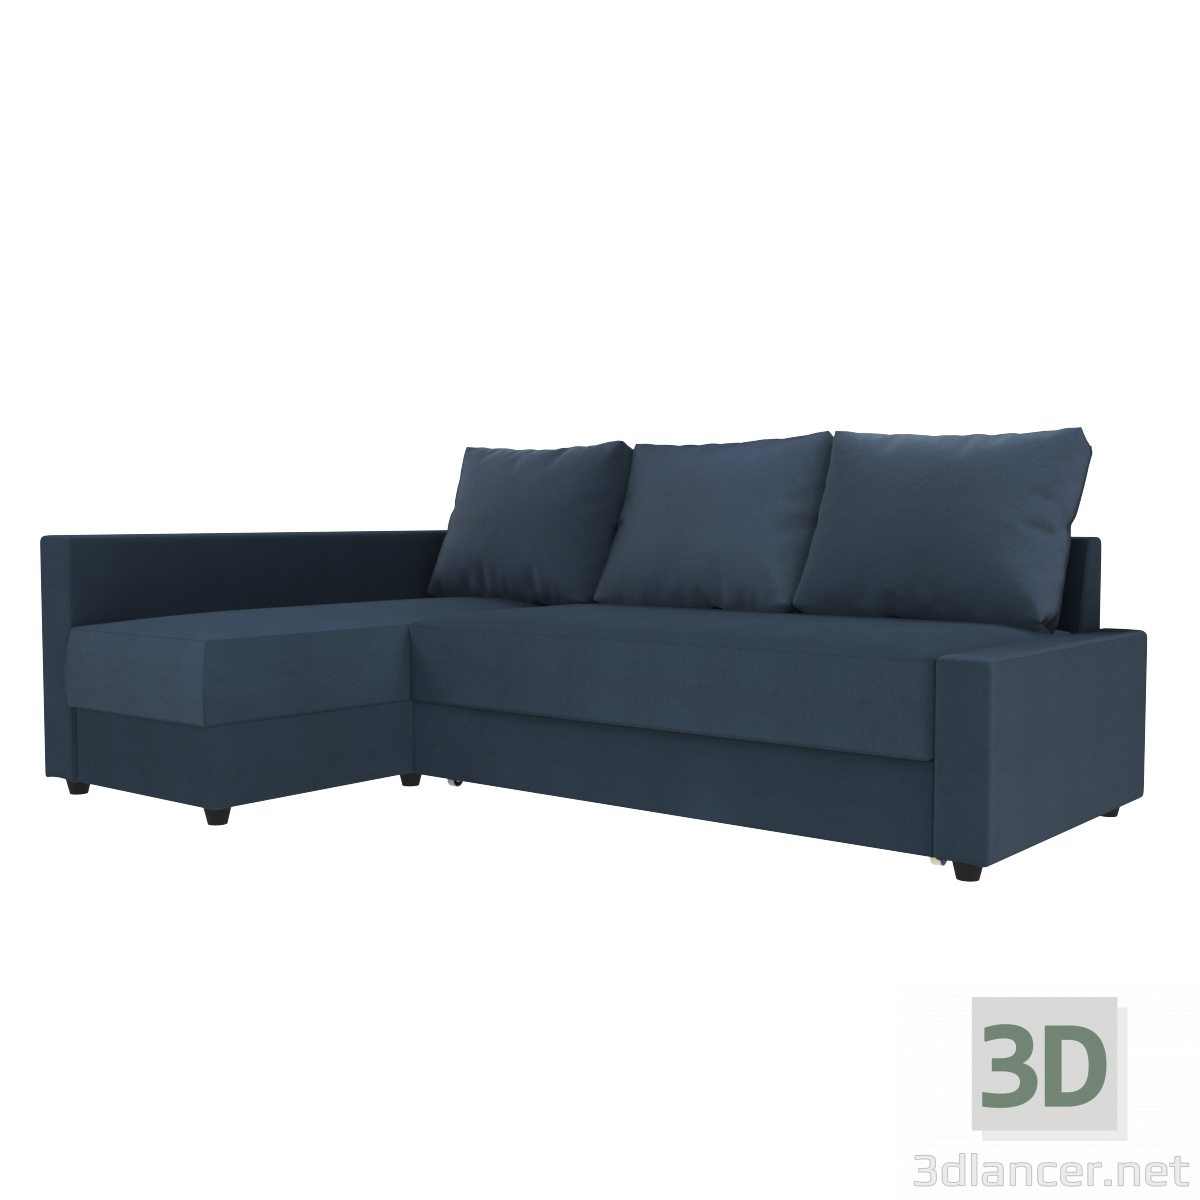 3d corner sofa FRICHETEN IKEA model buy - render